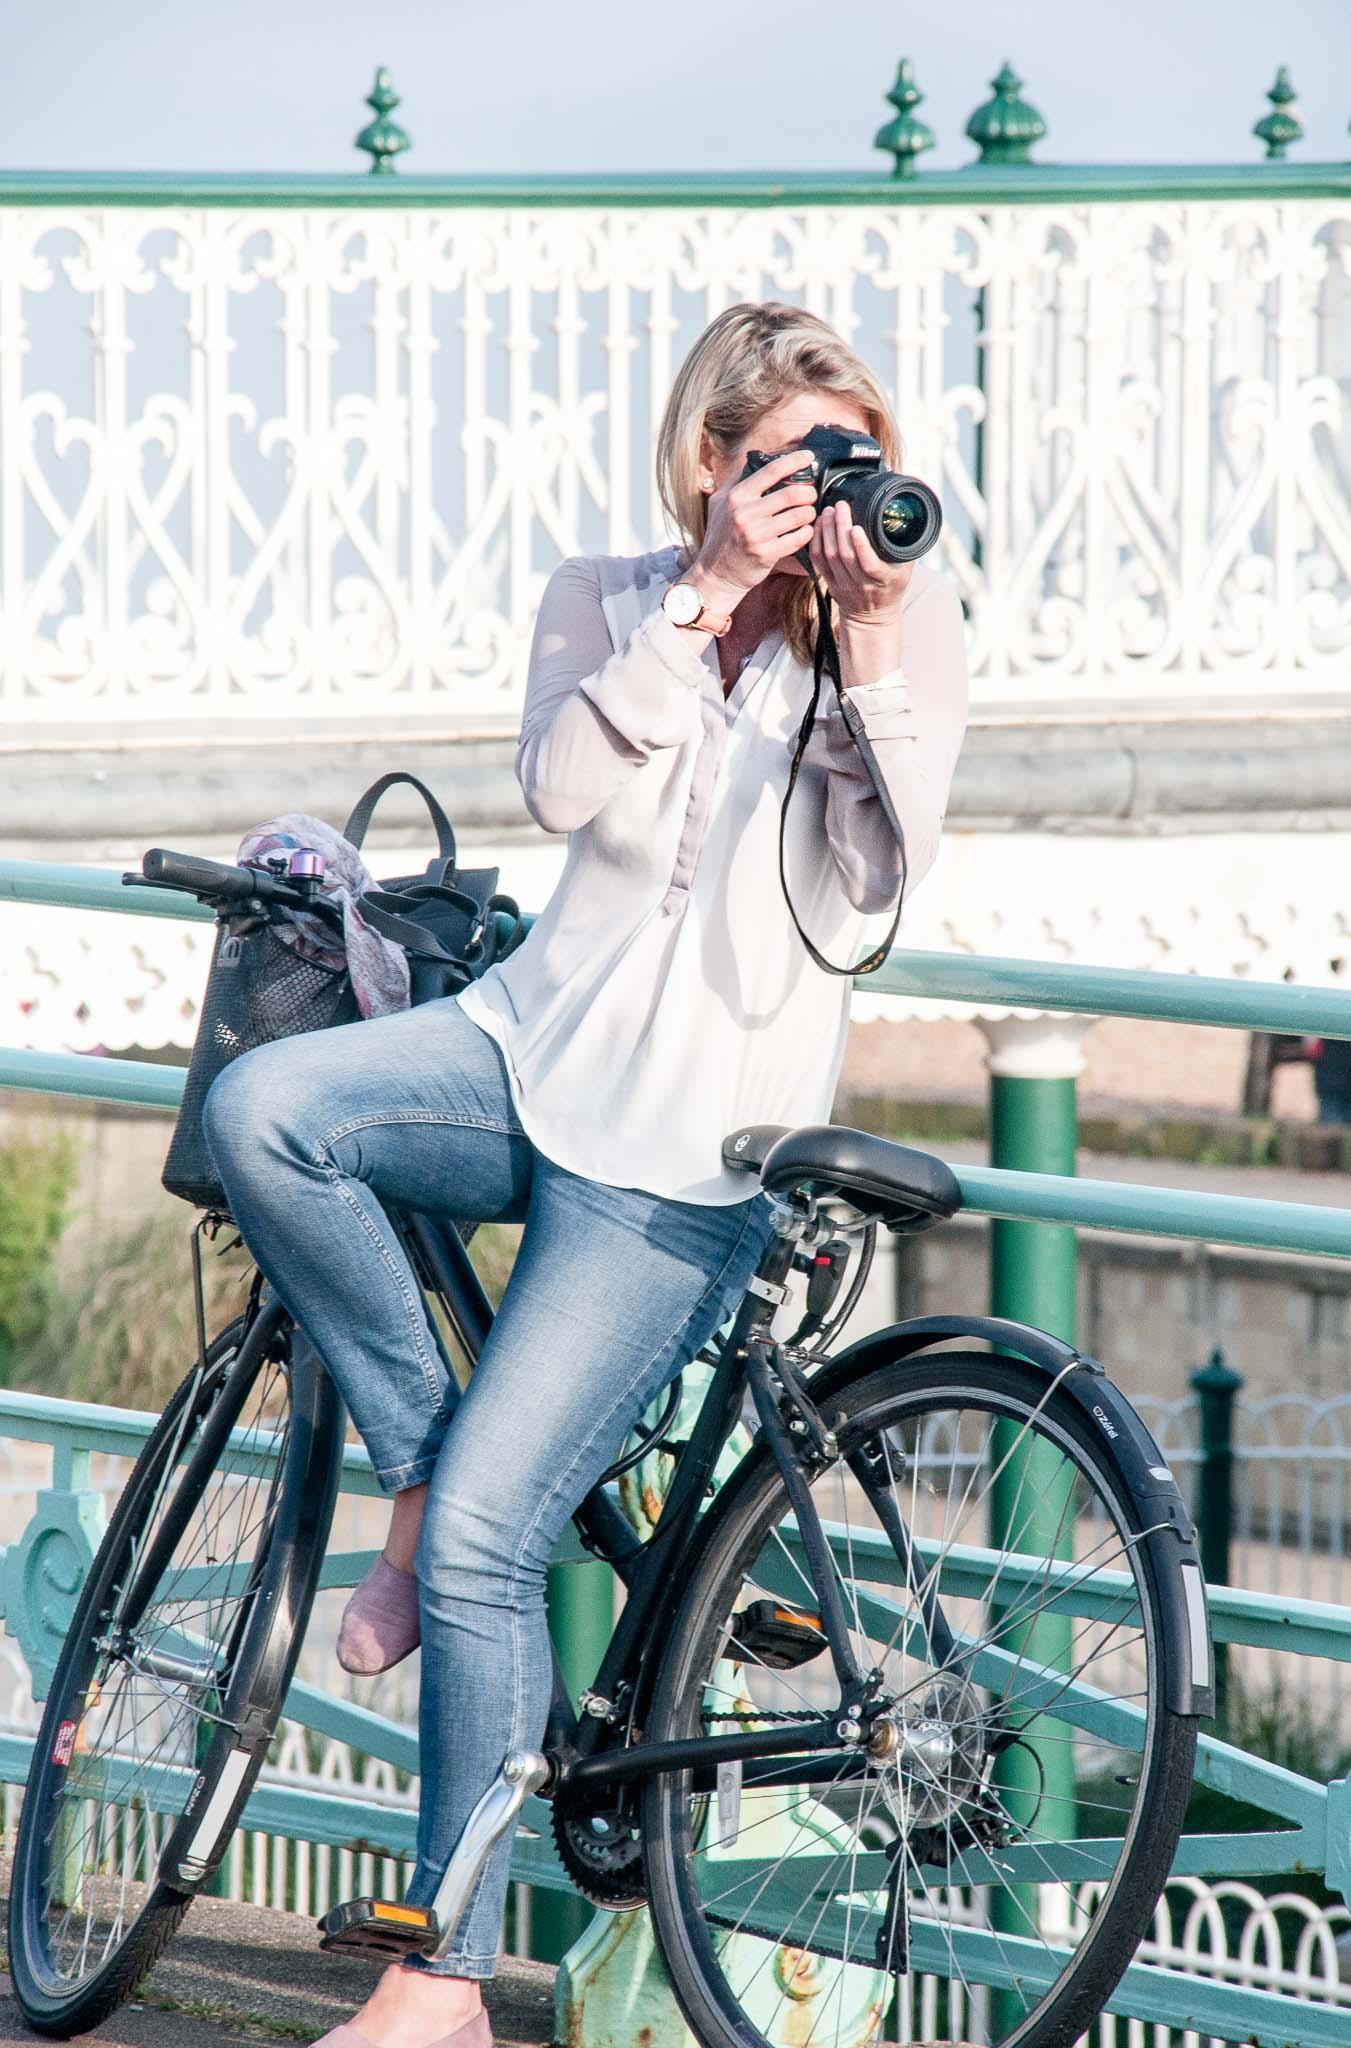 Professional Portrait Photographer - Magdalena Smolarska Photography